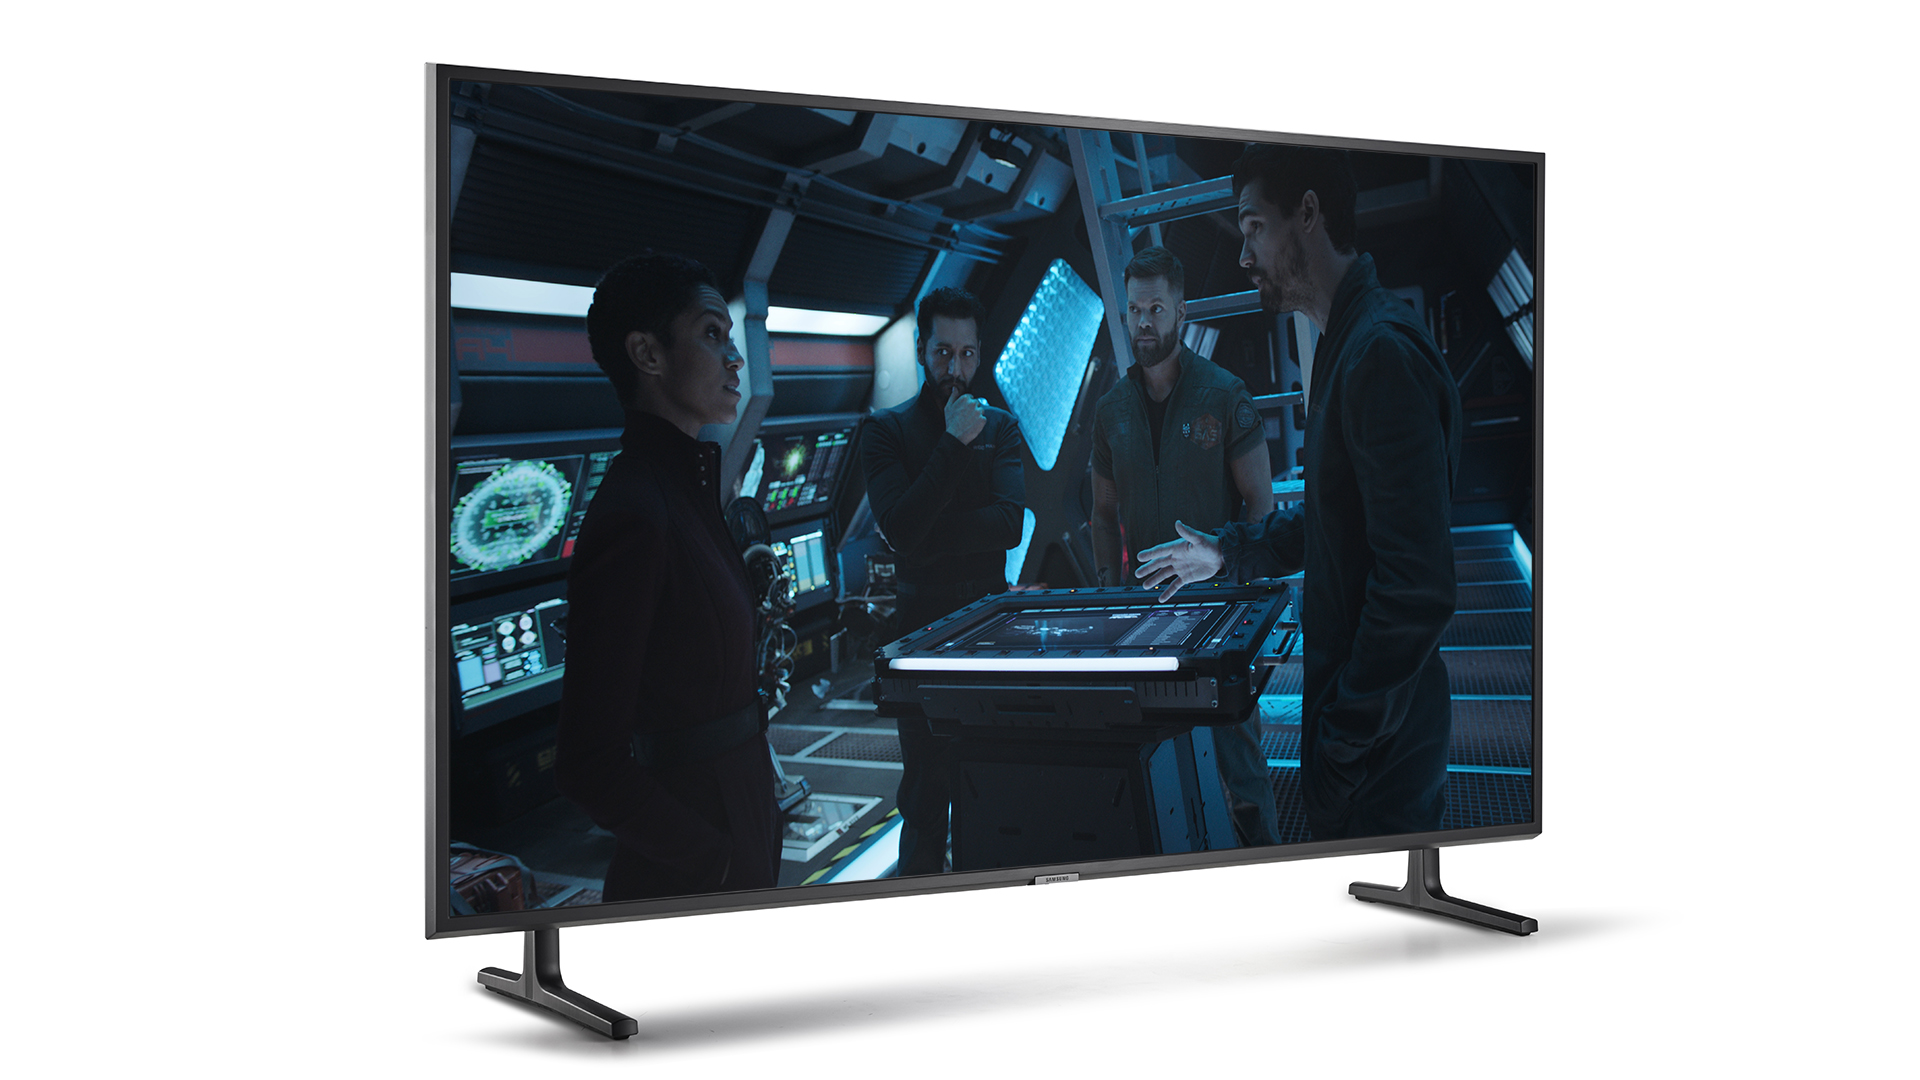 The best TV deals under £500